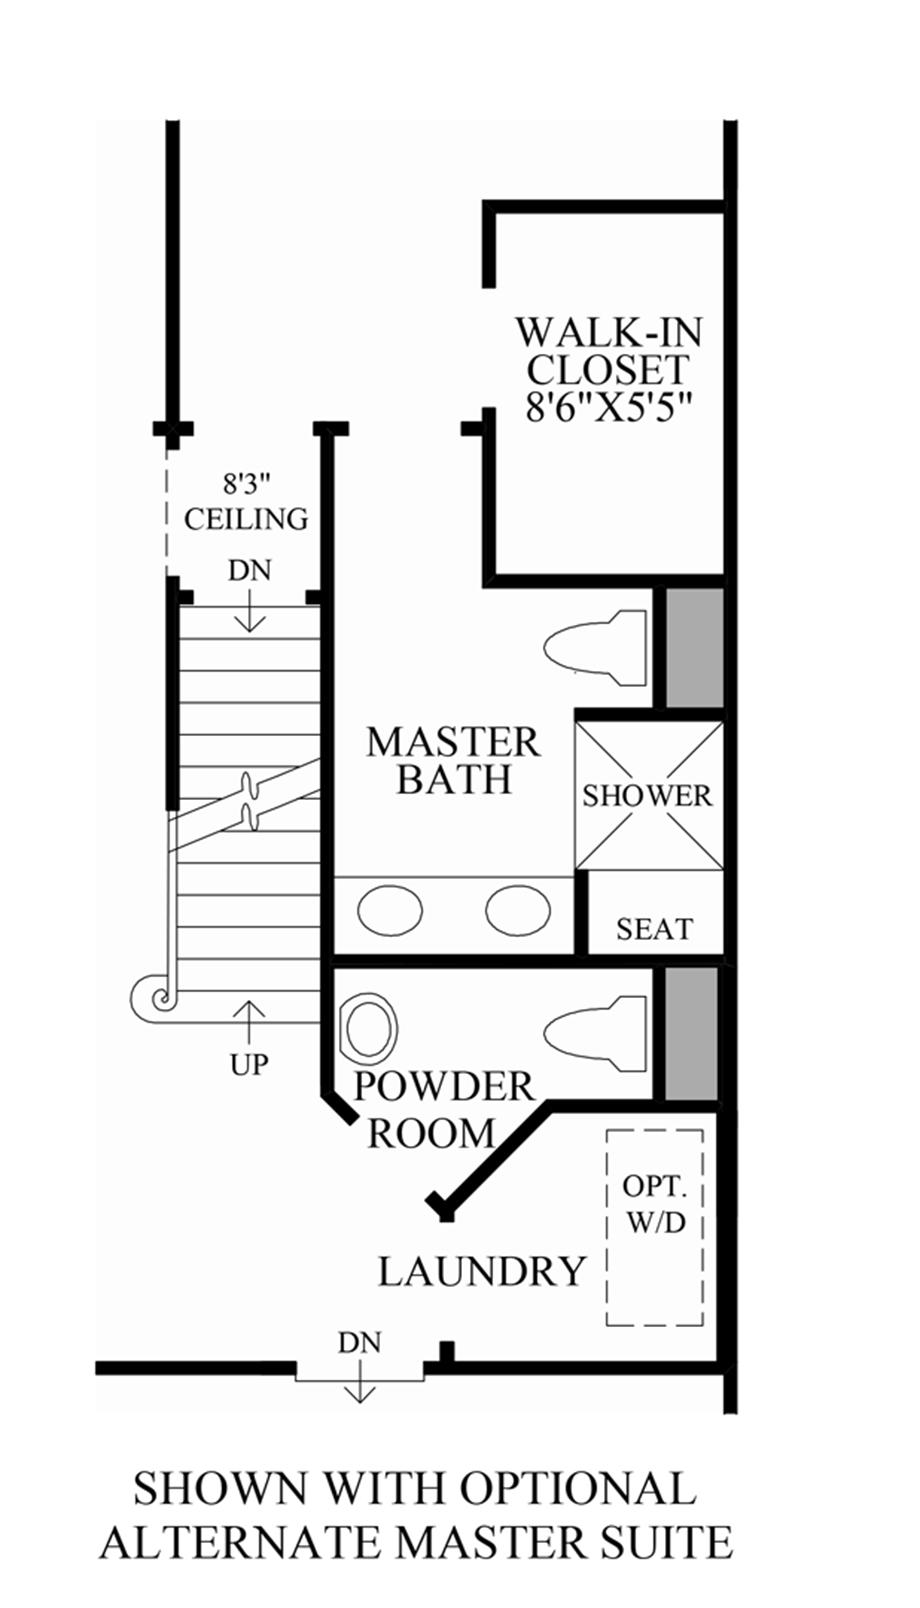 Optional Alternate Master Suite Floor Plan